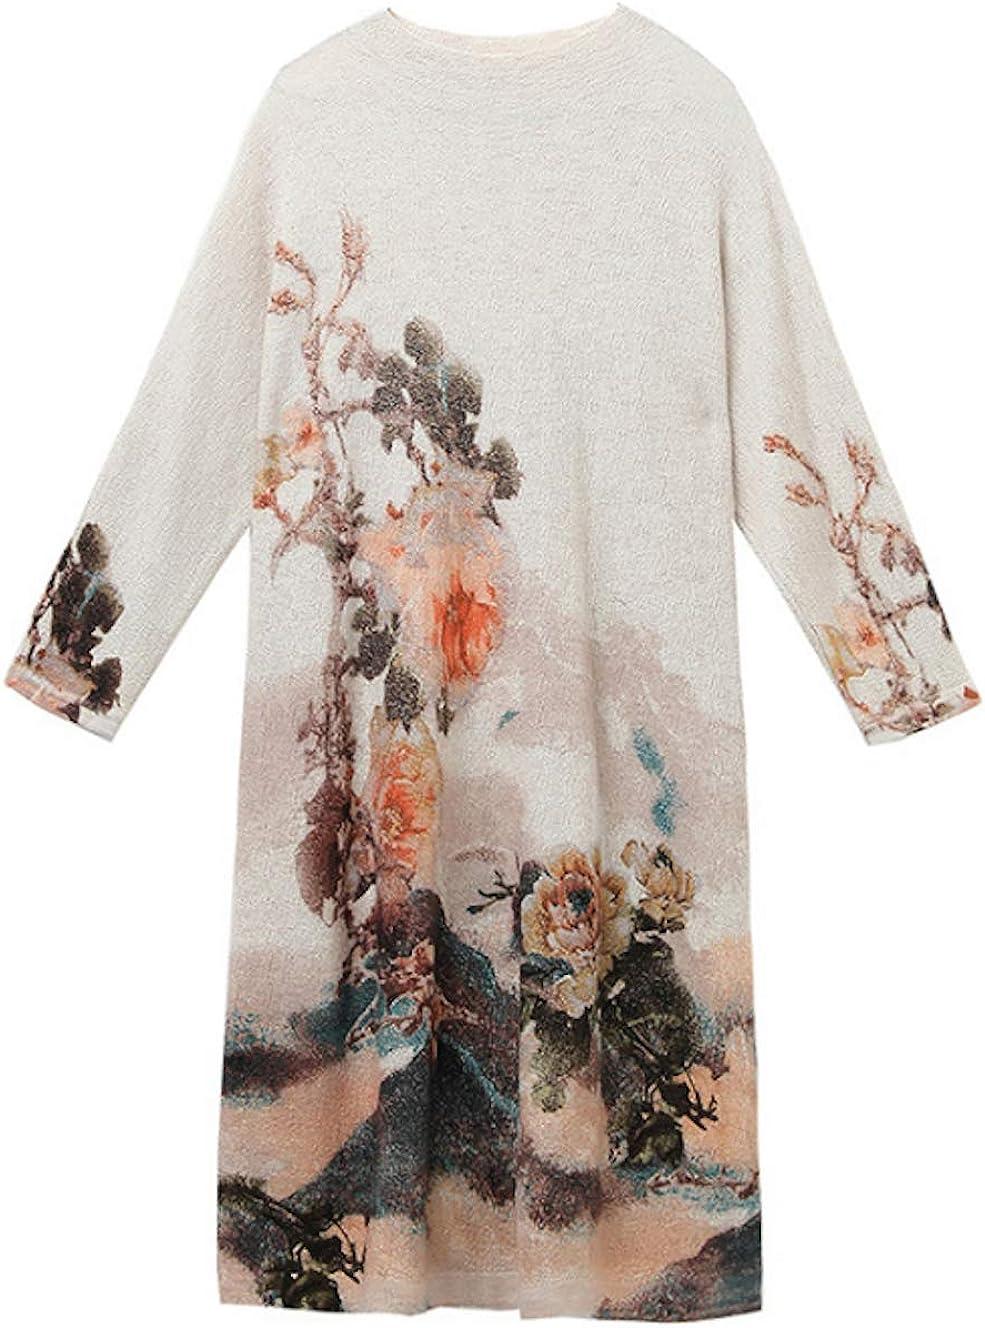 HangErFeng Dress Printed Wool Knitting Stretch Mock Neck Pullover Long Slim Sweater Skirt 1161 Paragraph